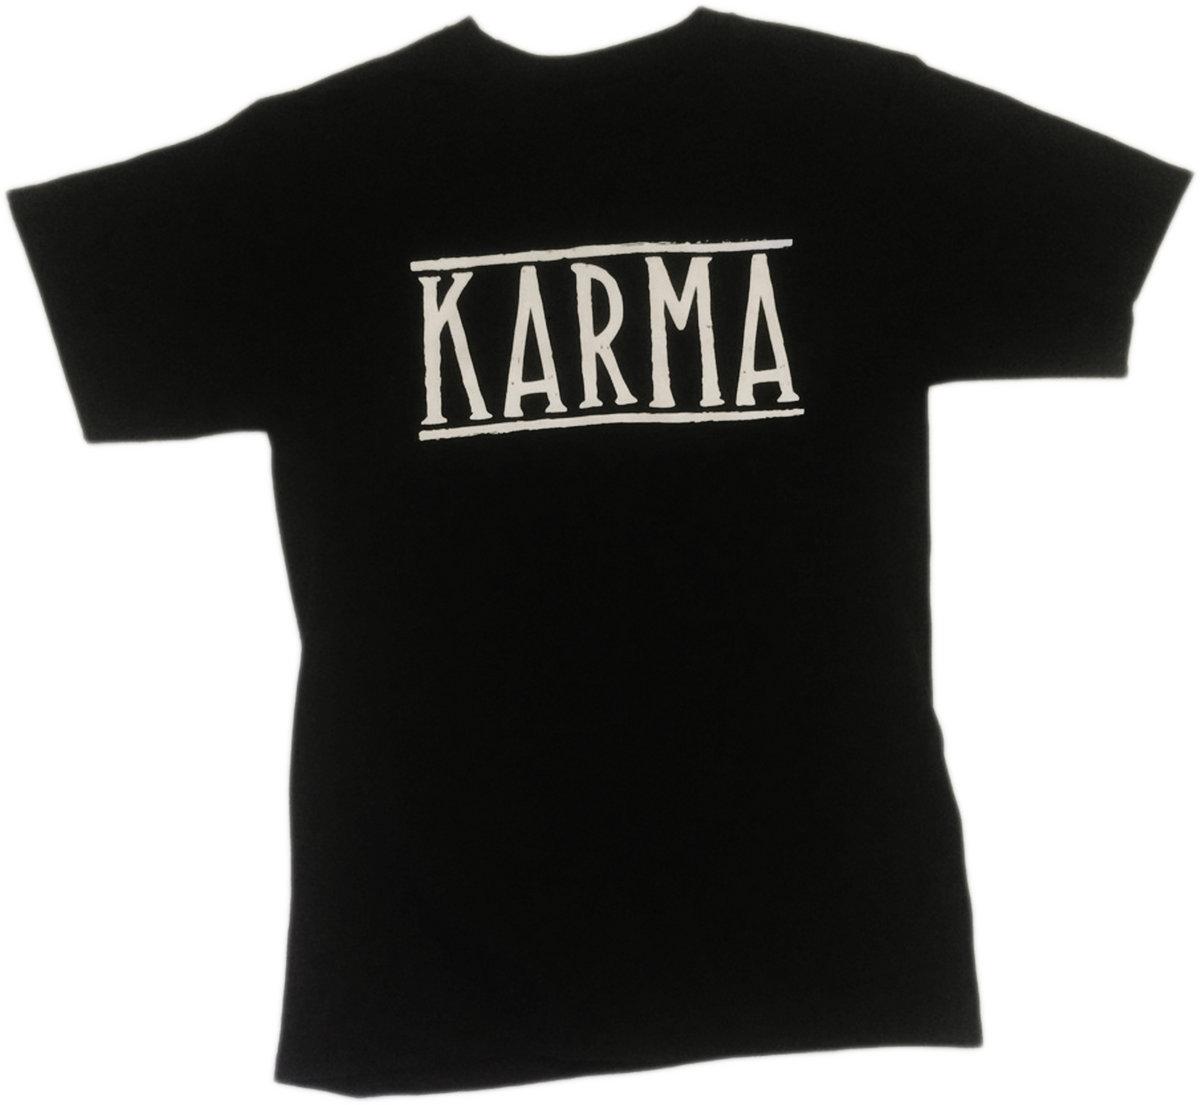 T shirt design reno nv - Karma T Shirt Design Main Photo